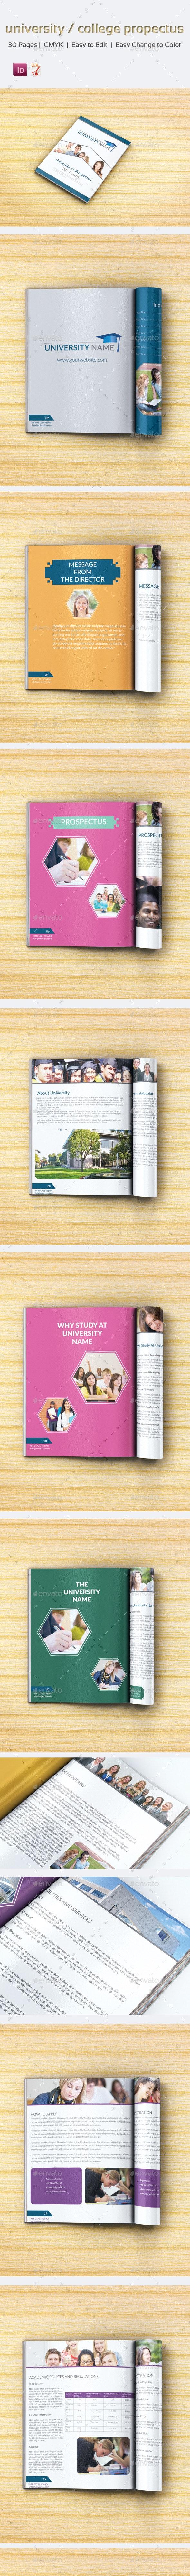 University/College Prospectus Template - Catalogs Brochures